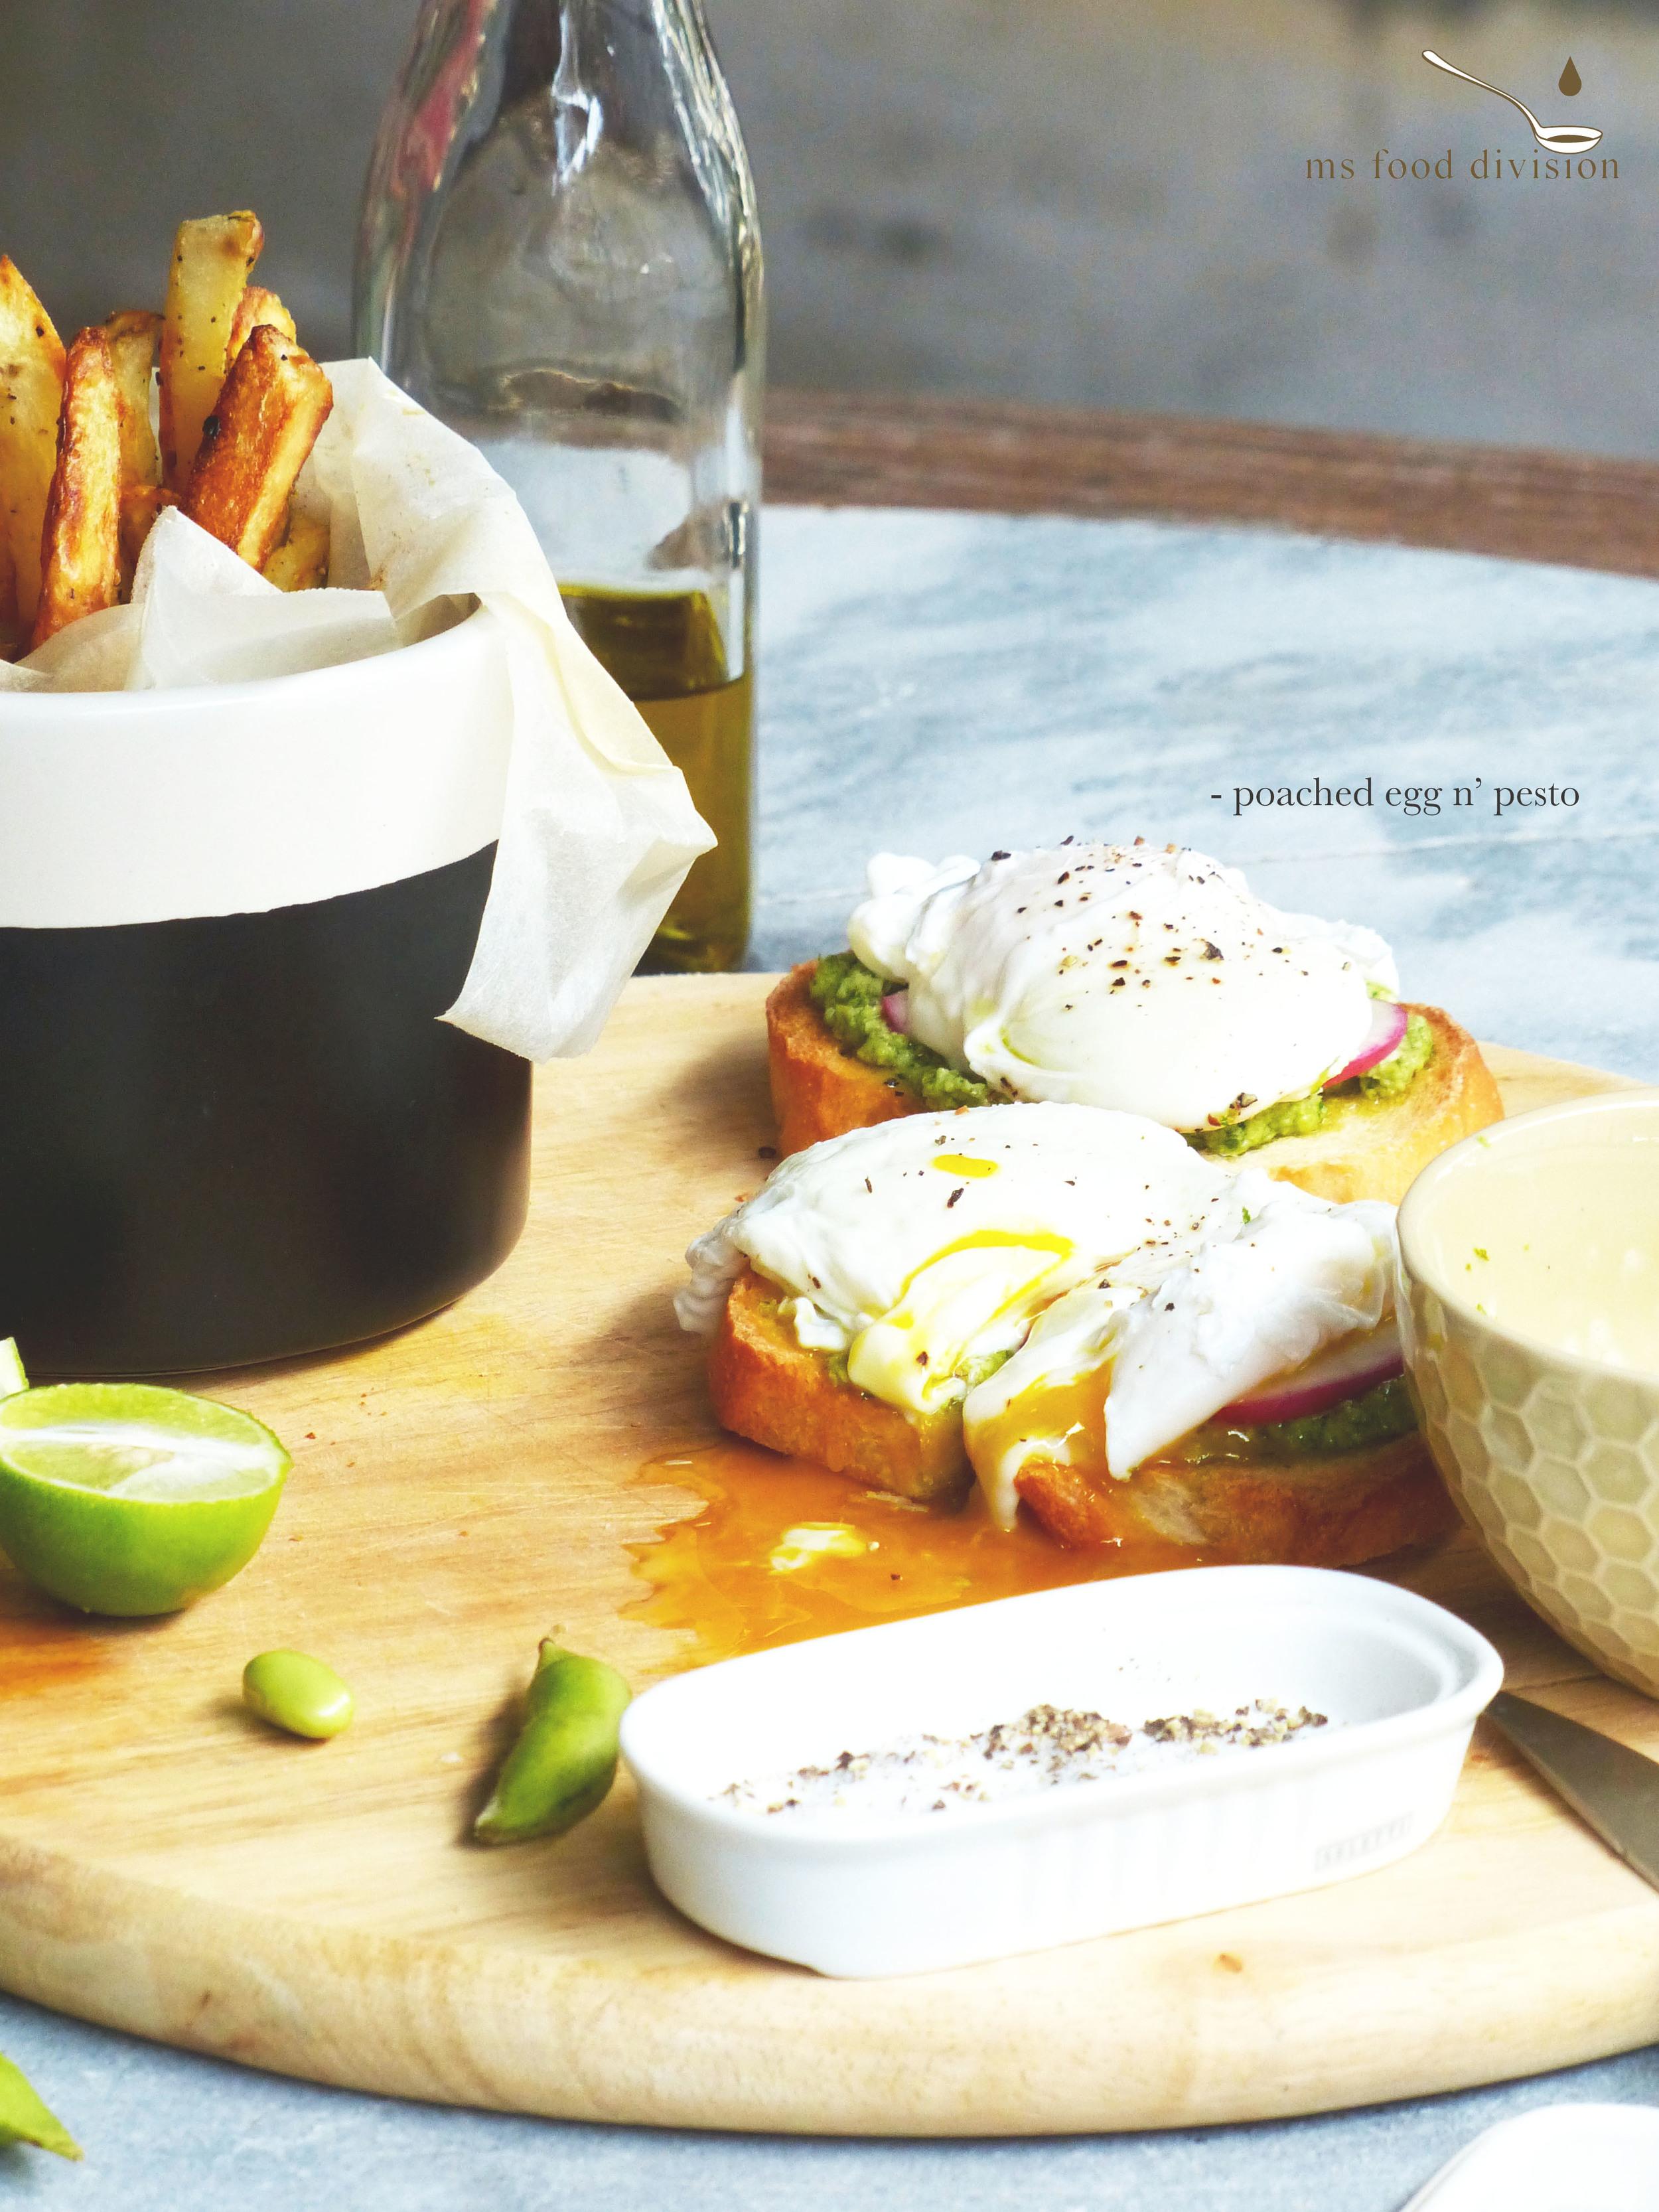 poached egg n' pesto2.jpg